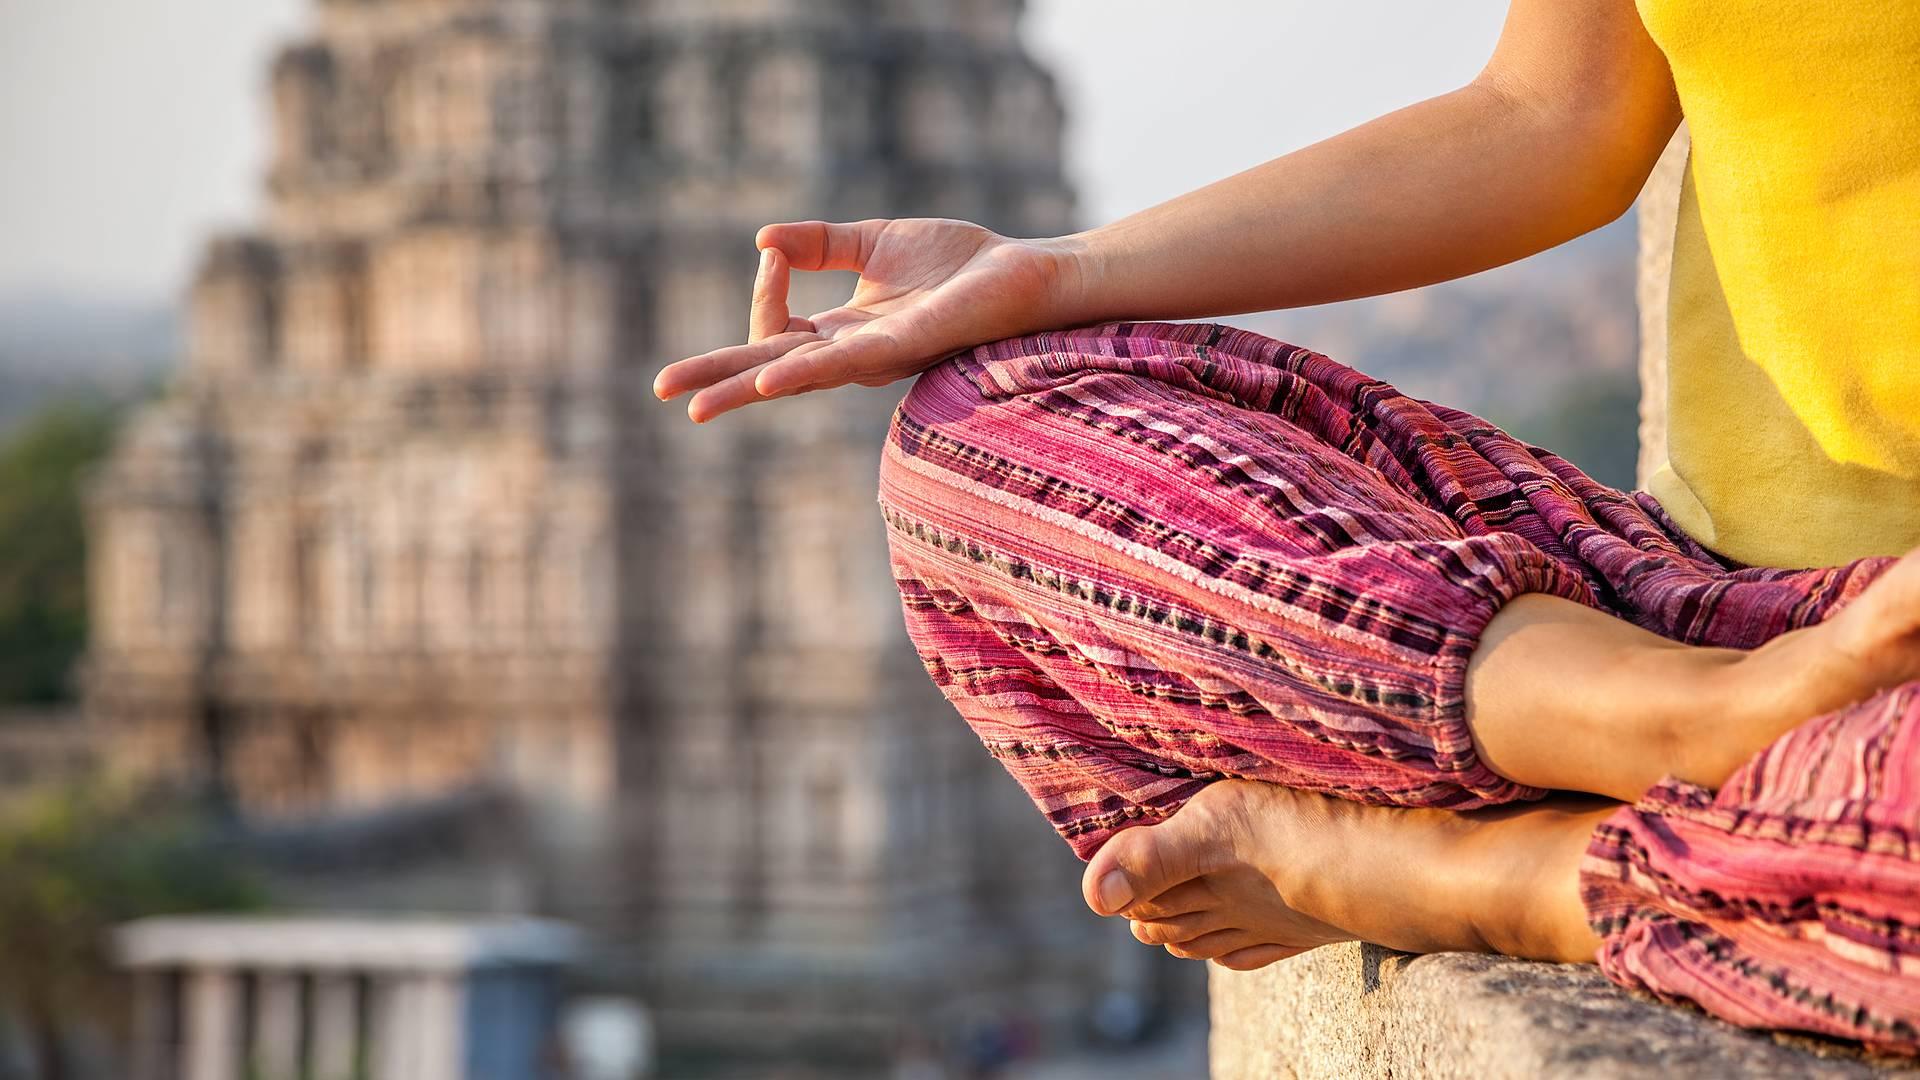 Viaggio spirituale e sacro fuori dai sentieri battuti